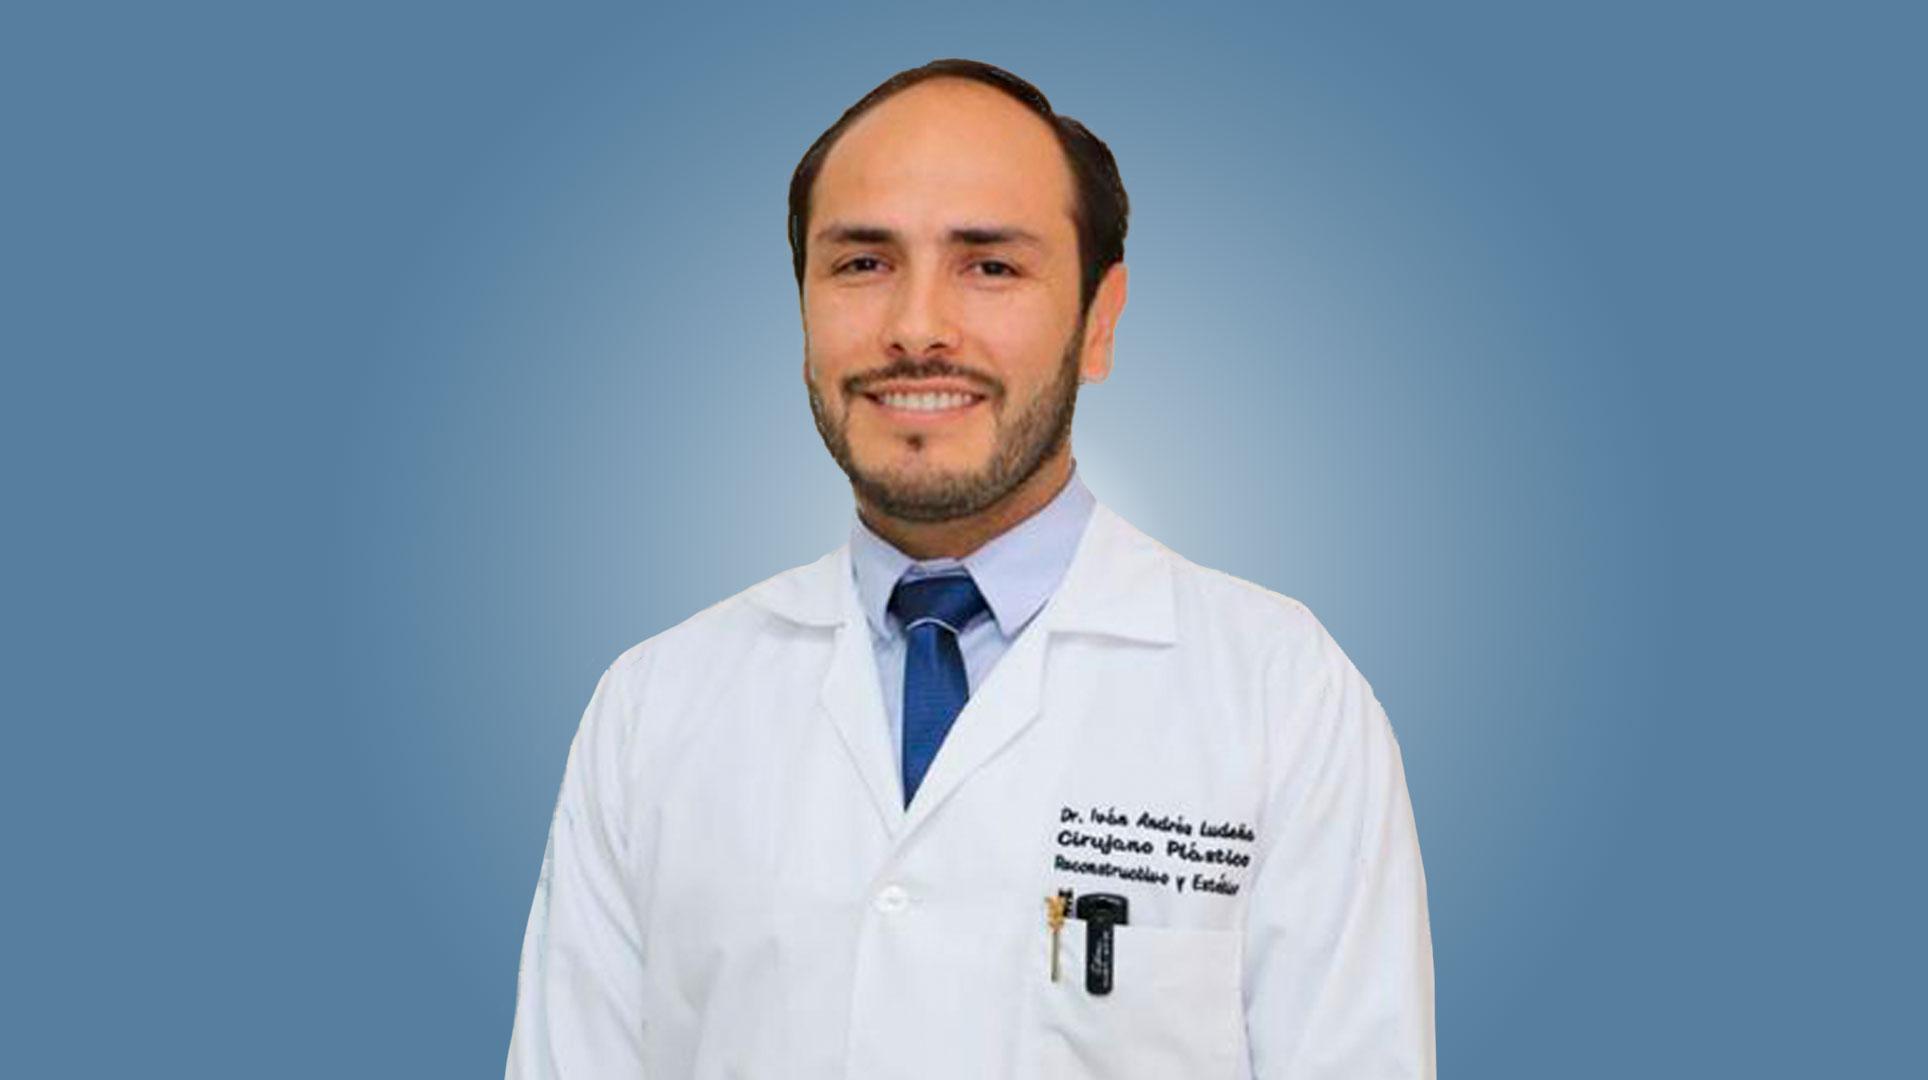 dr. ivan luduena